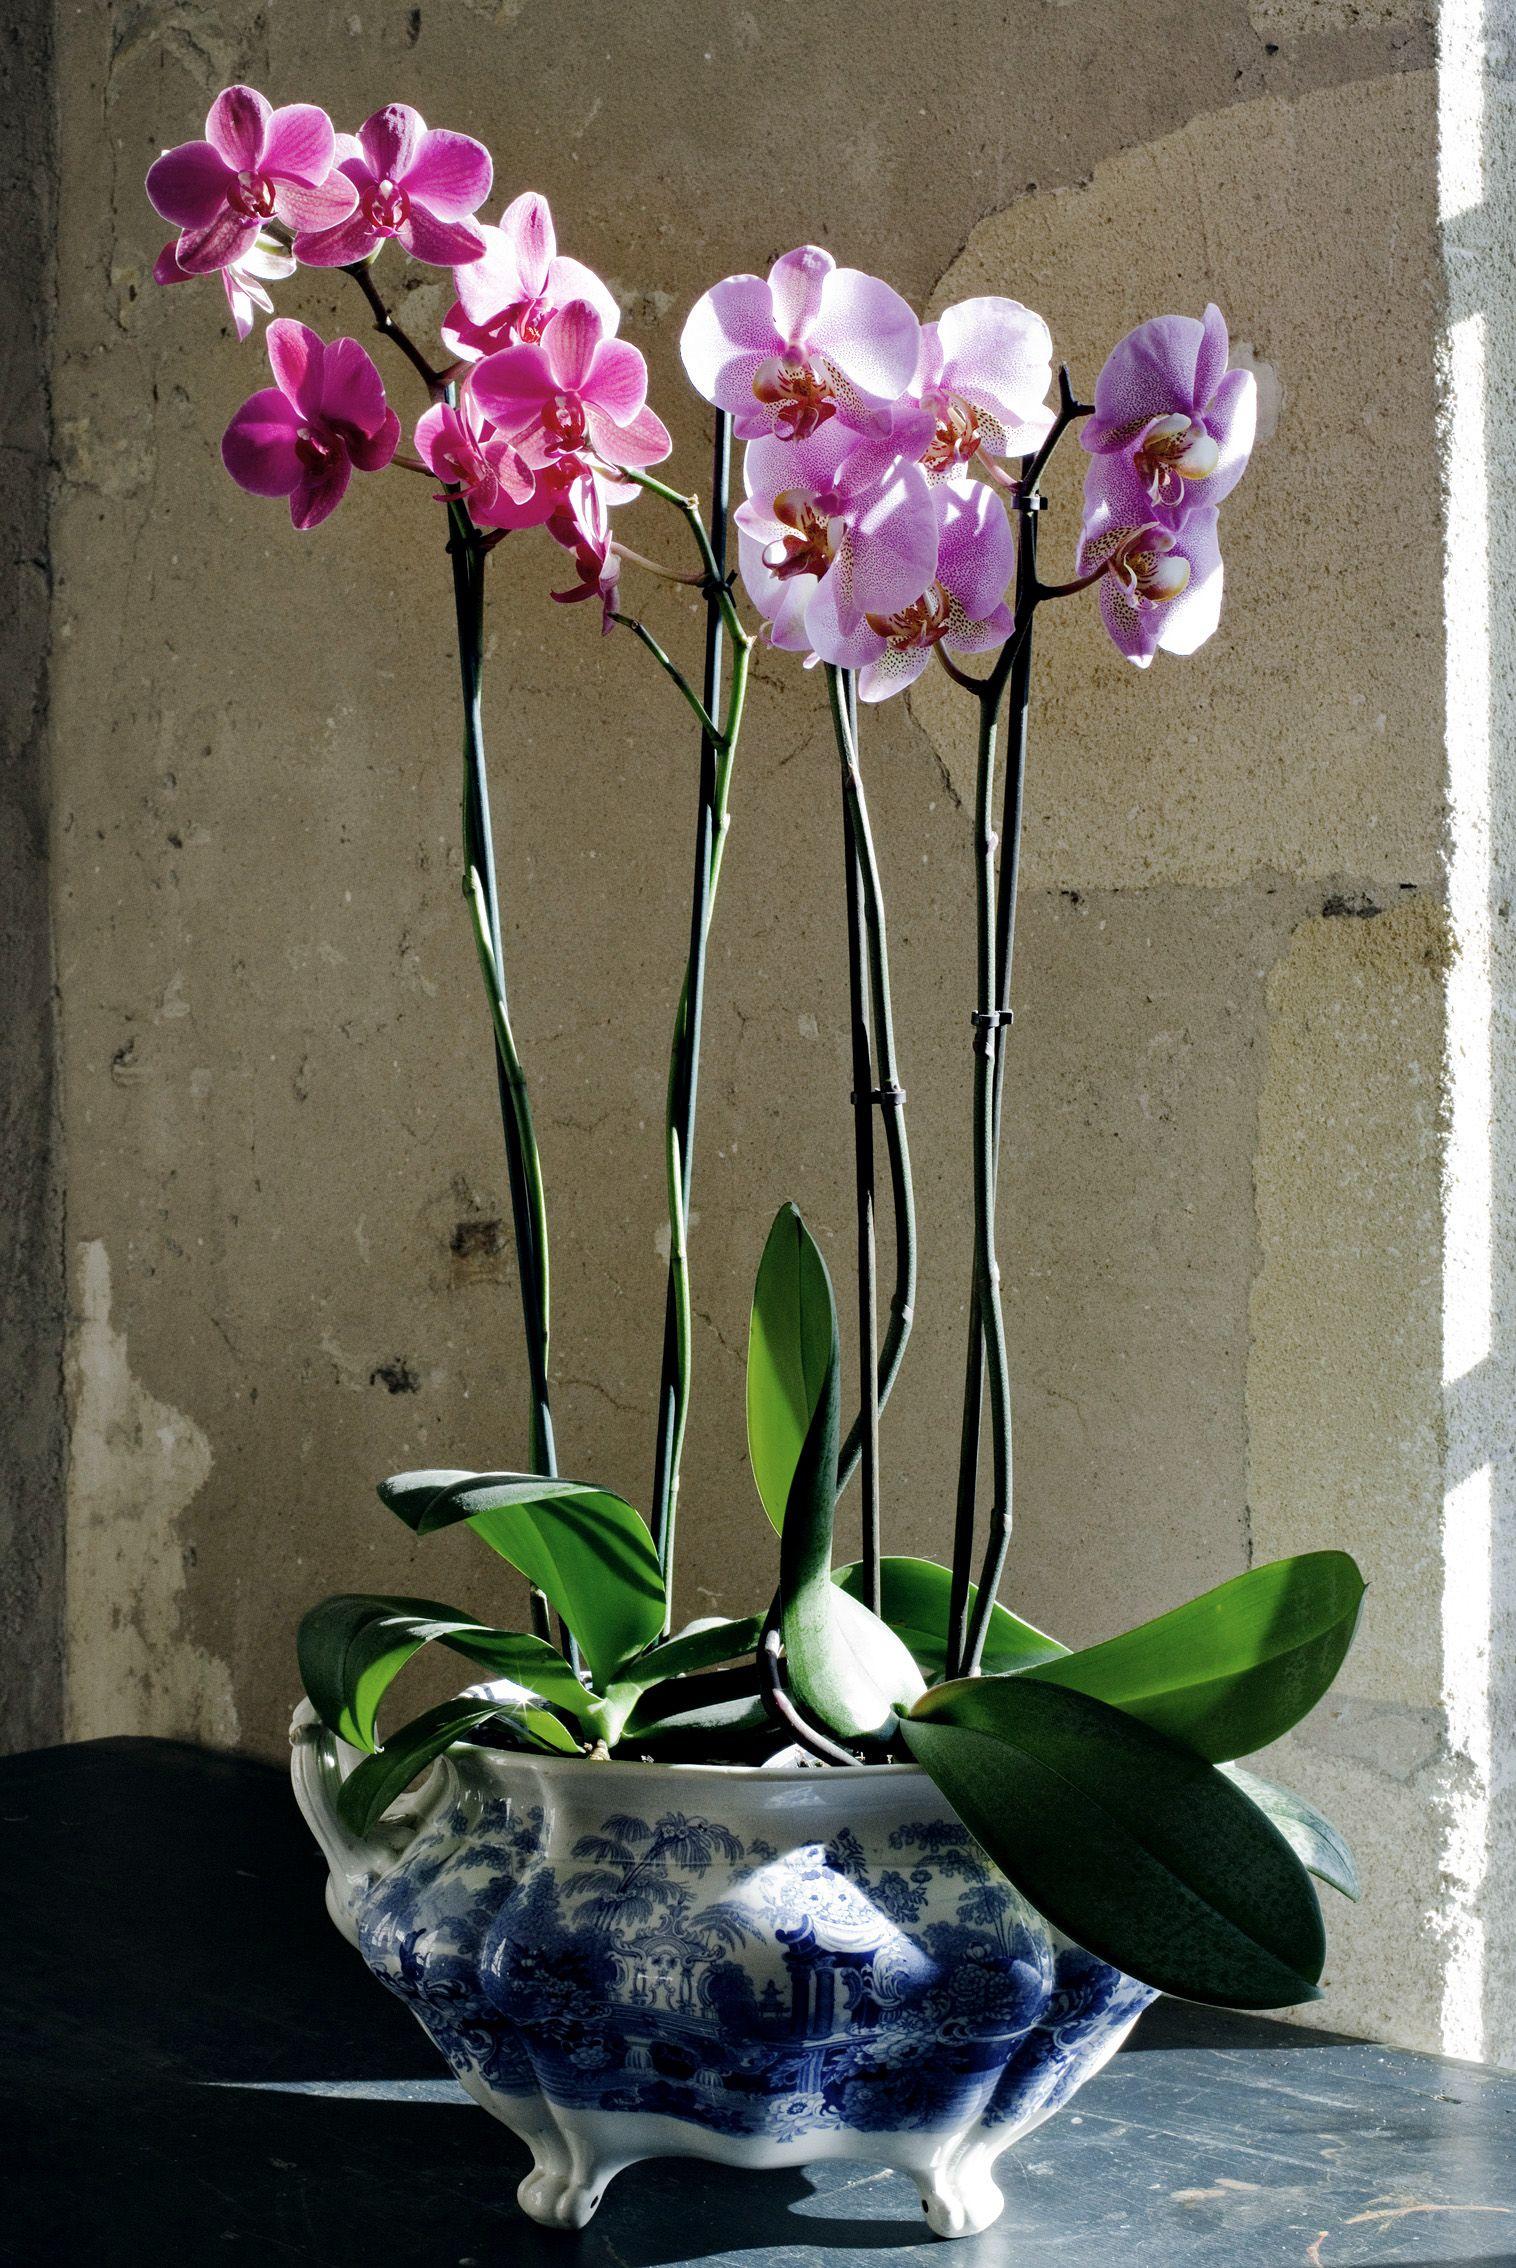 Hong Shao Pork Fava Bean Fritters Tea Eggs Orchid Pot Orchids Beautiful Orchids